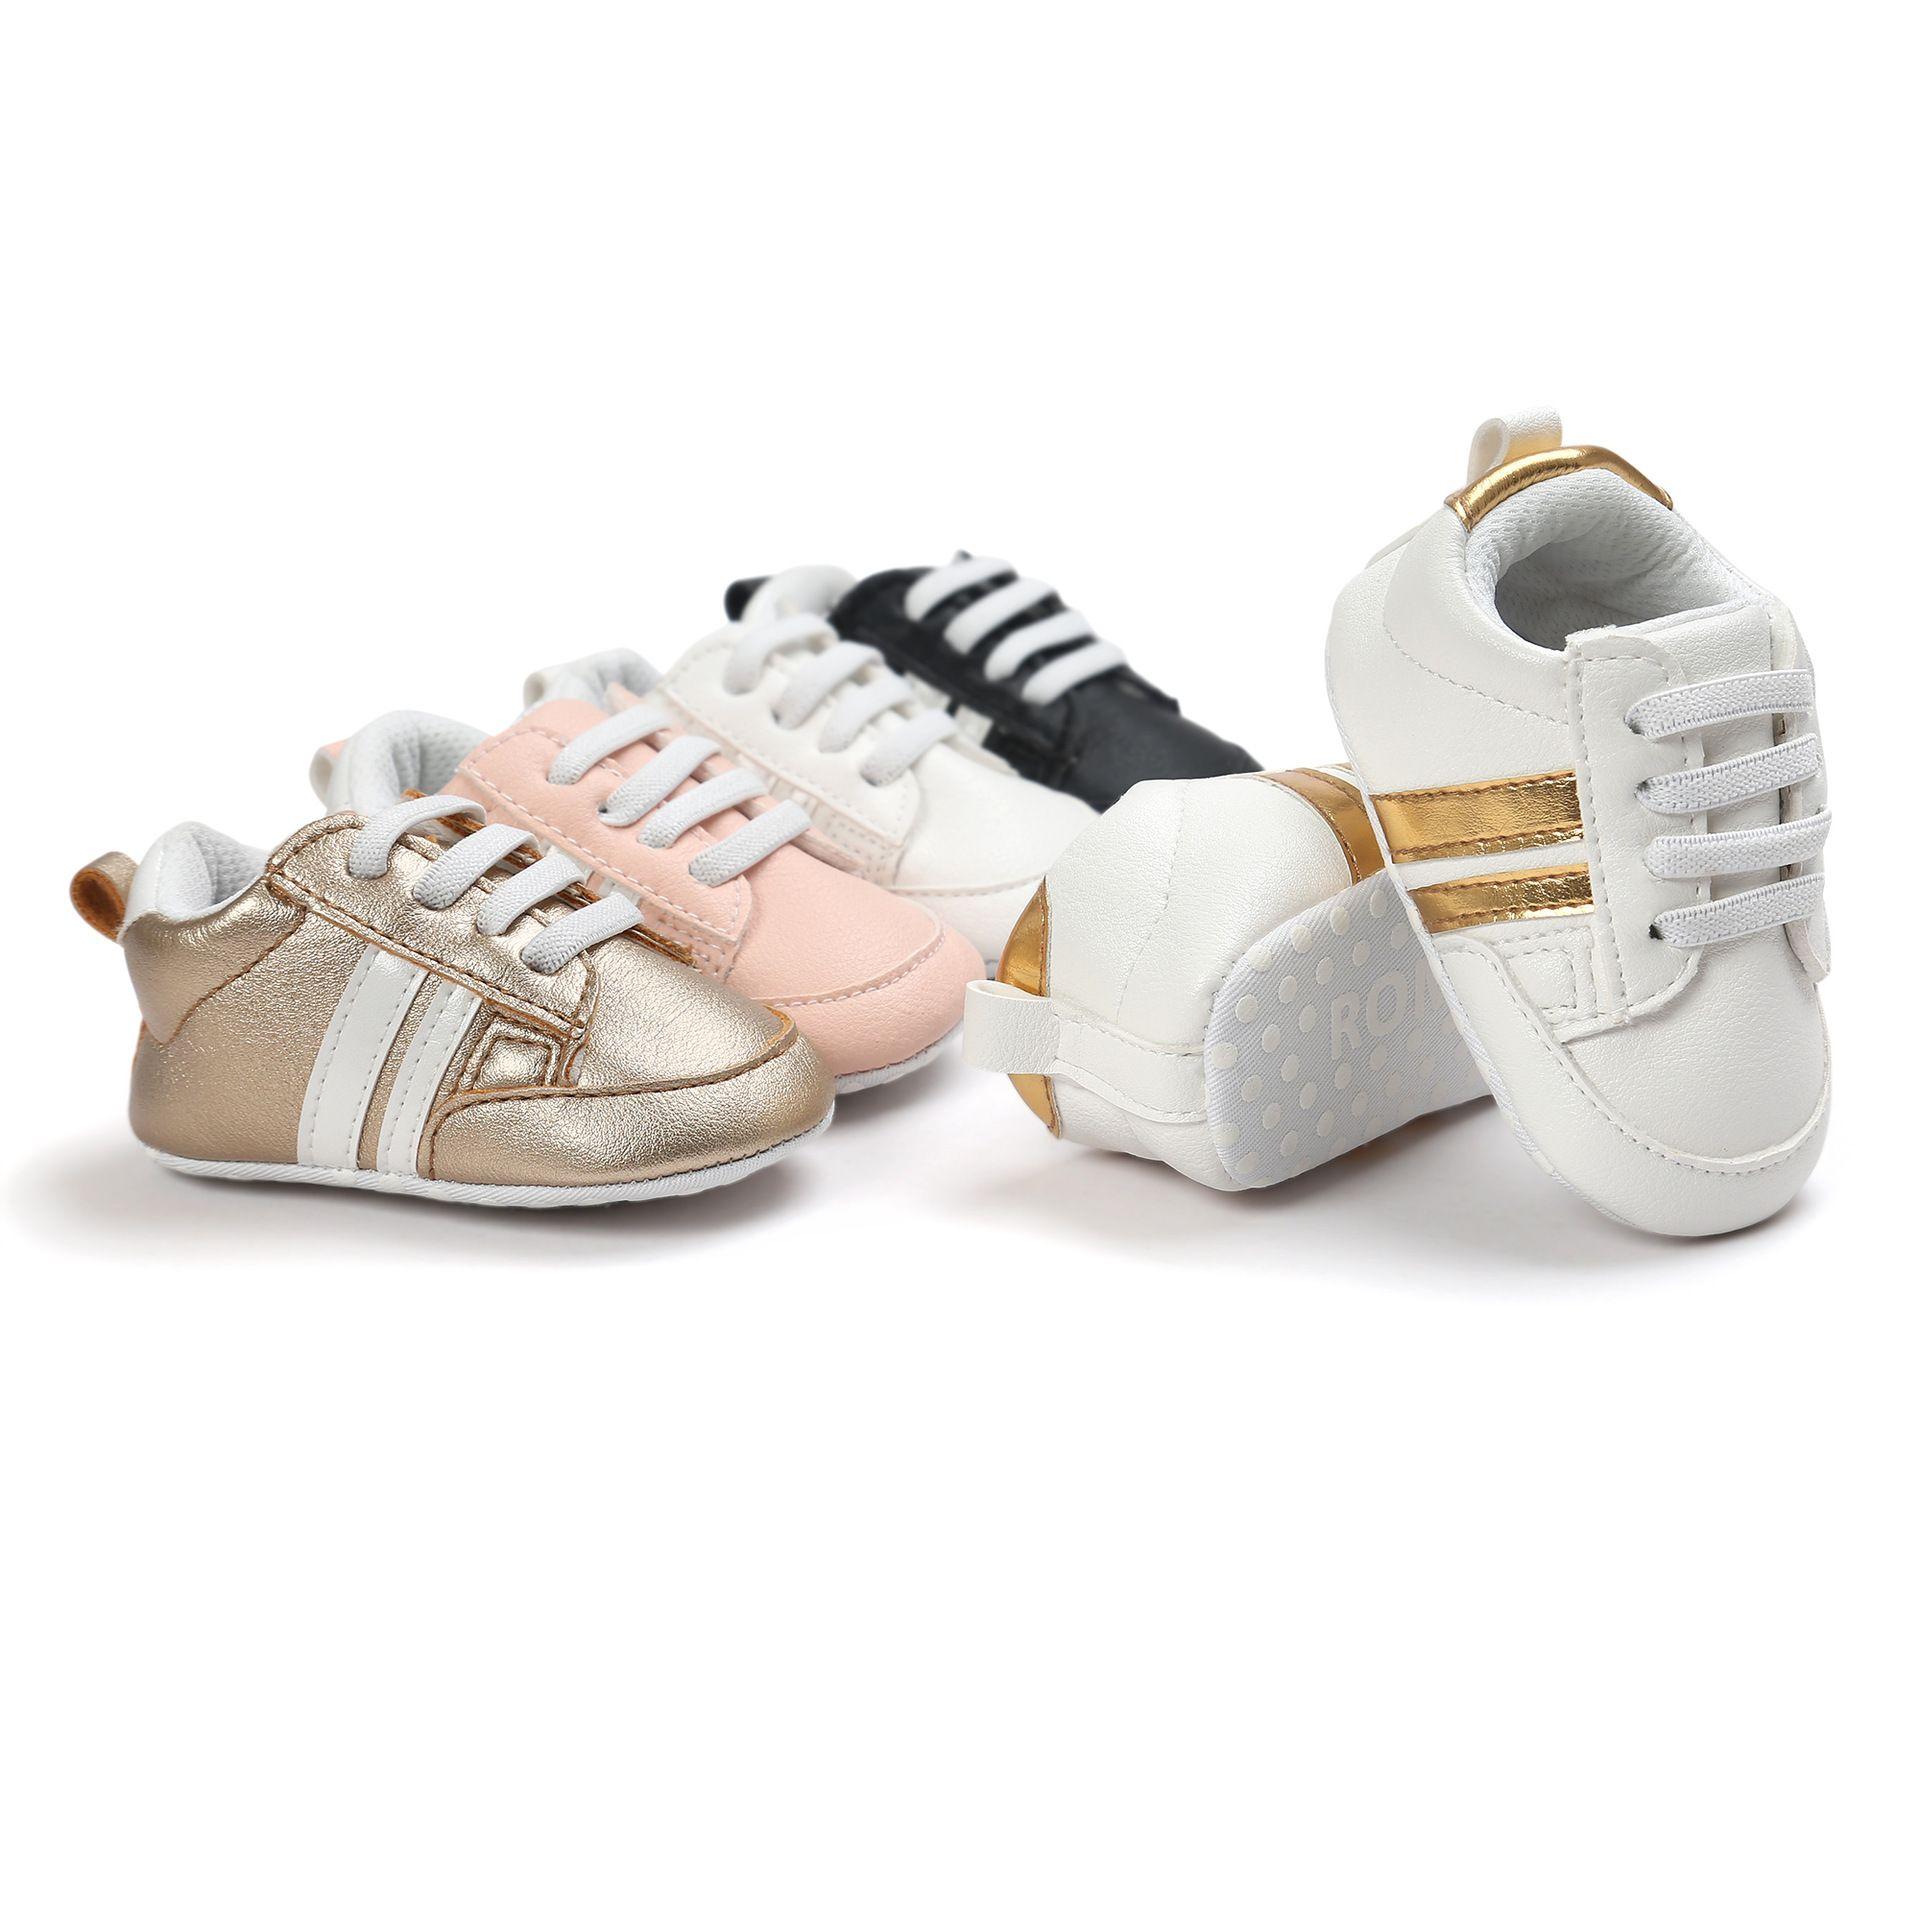 2018 Pu Leather Shoe Baby Shoes Soft Bottom Anti Skidfor Infant